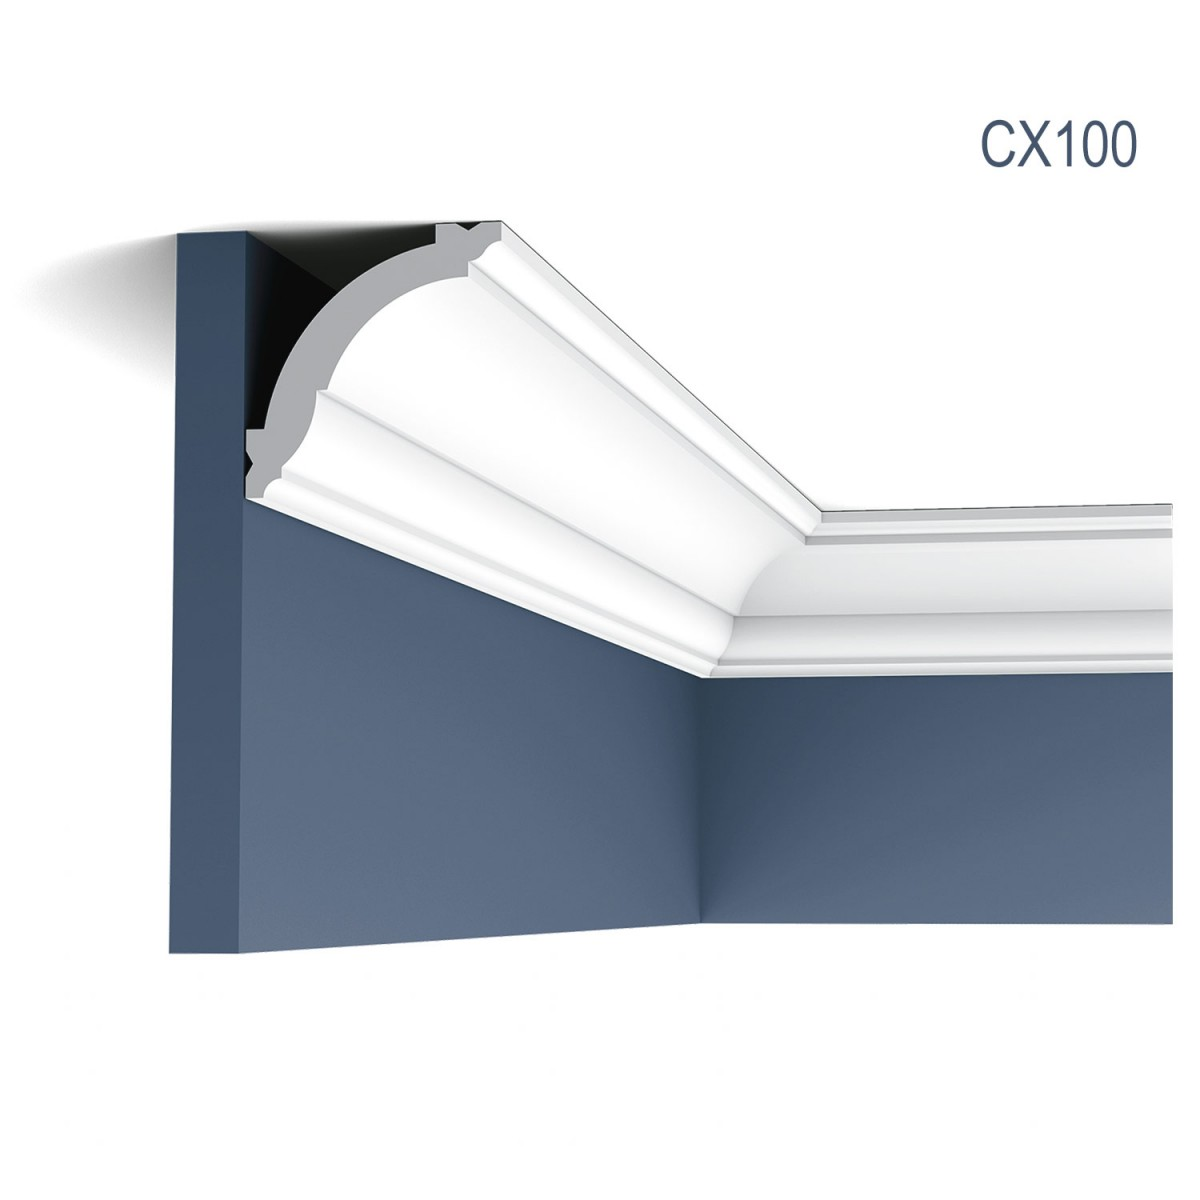 Cornisa Axxent CX100, Dimensiuni: 200 X 6.9 X 7.1 cm, Orac Decor